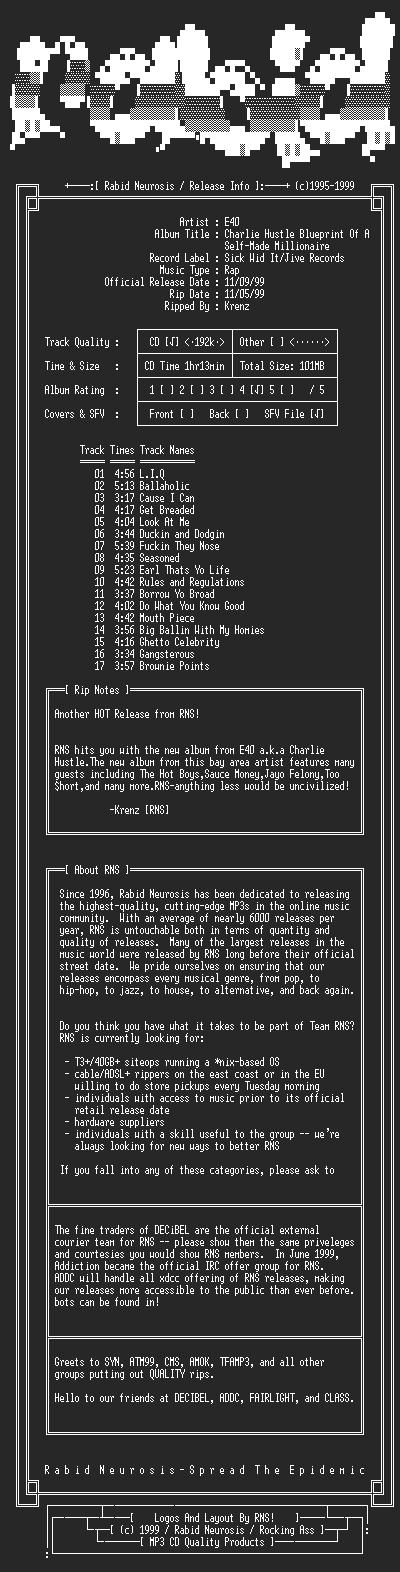 NFO file for E40-Charlie_Hustle_Blueprint_of_a_Self-made_Millionaire-1999-RNS